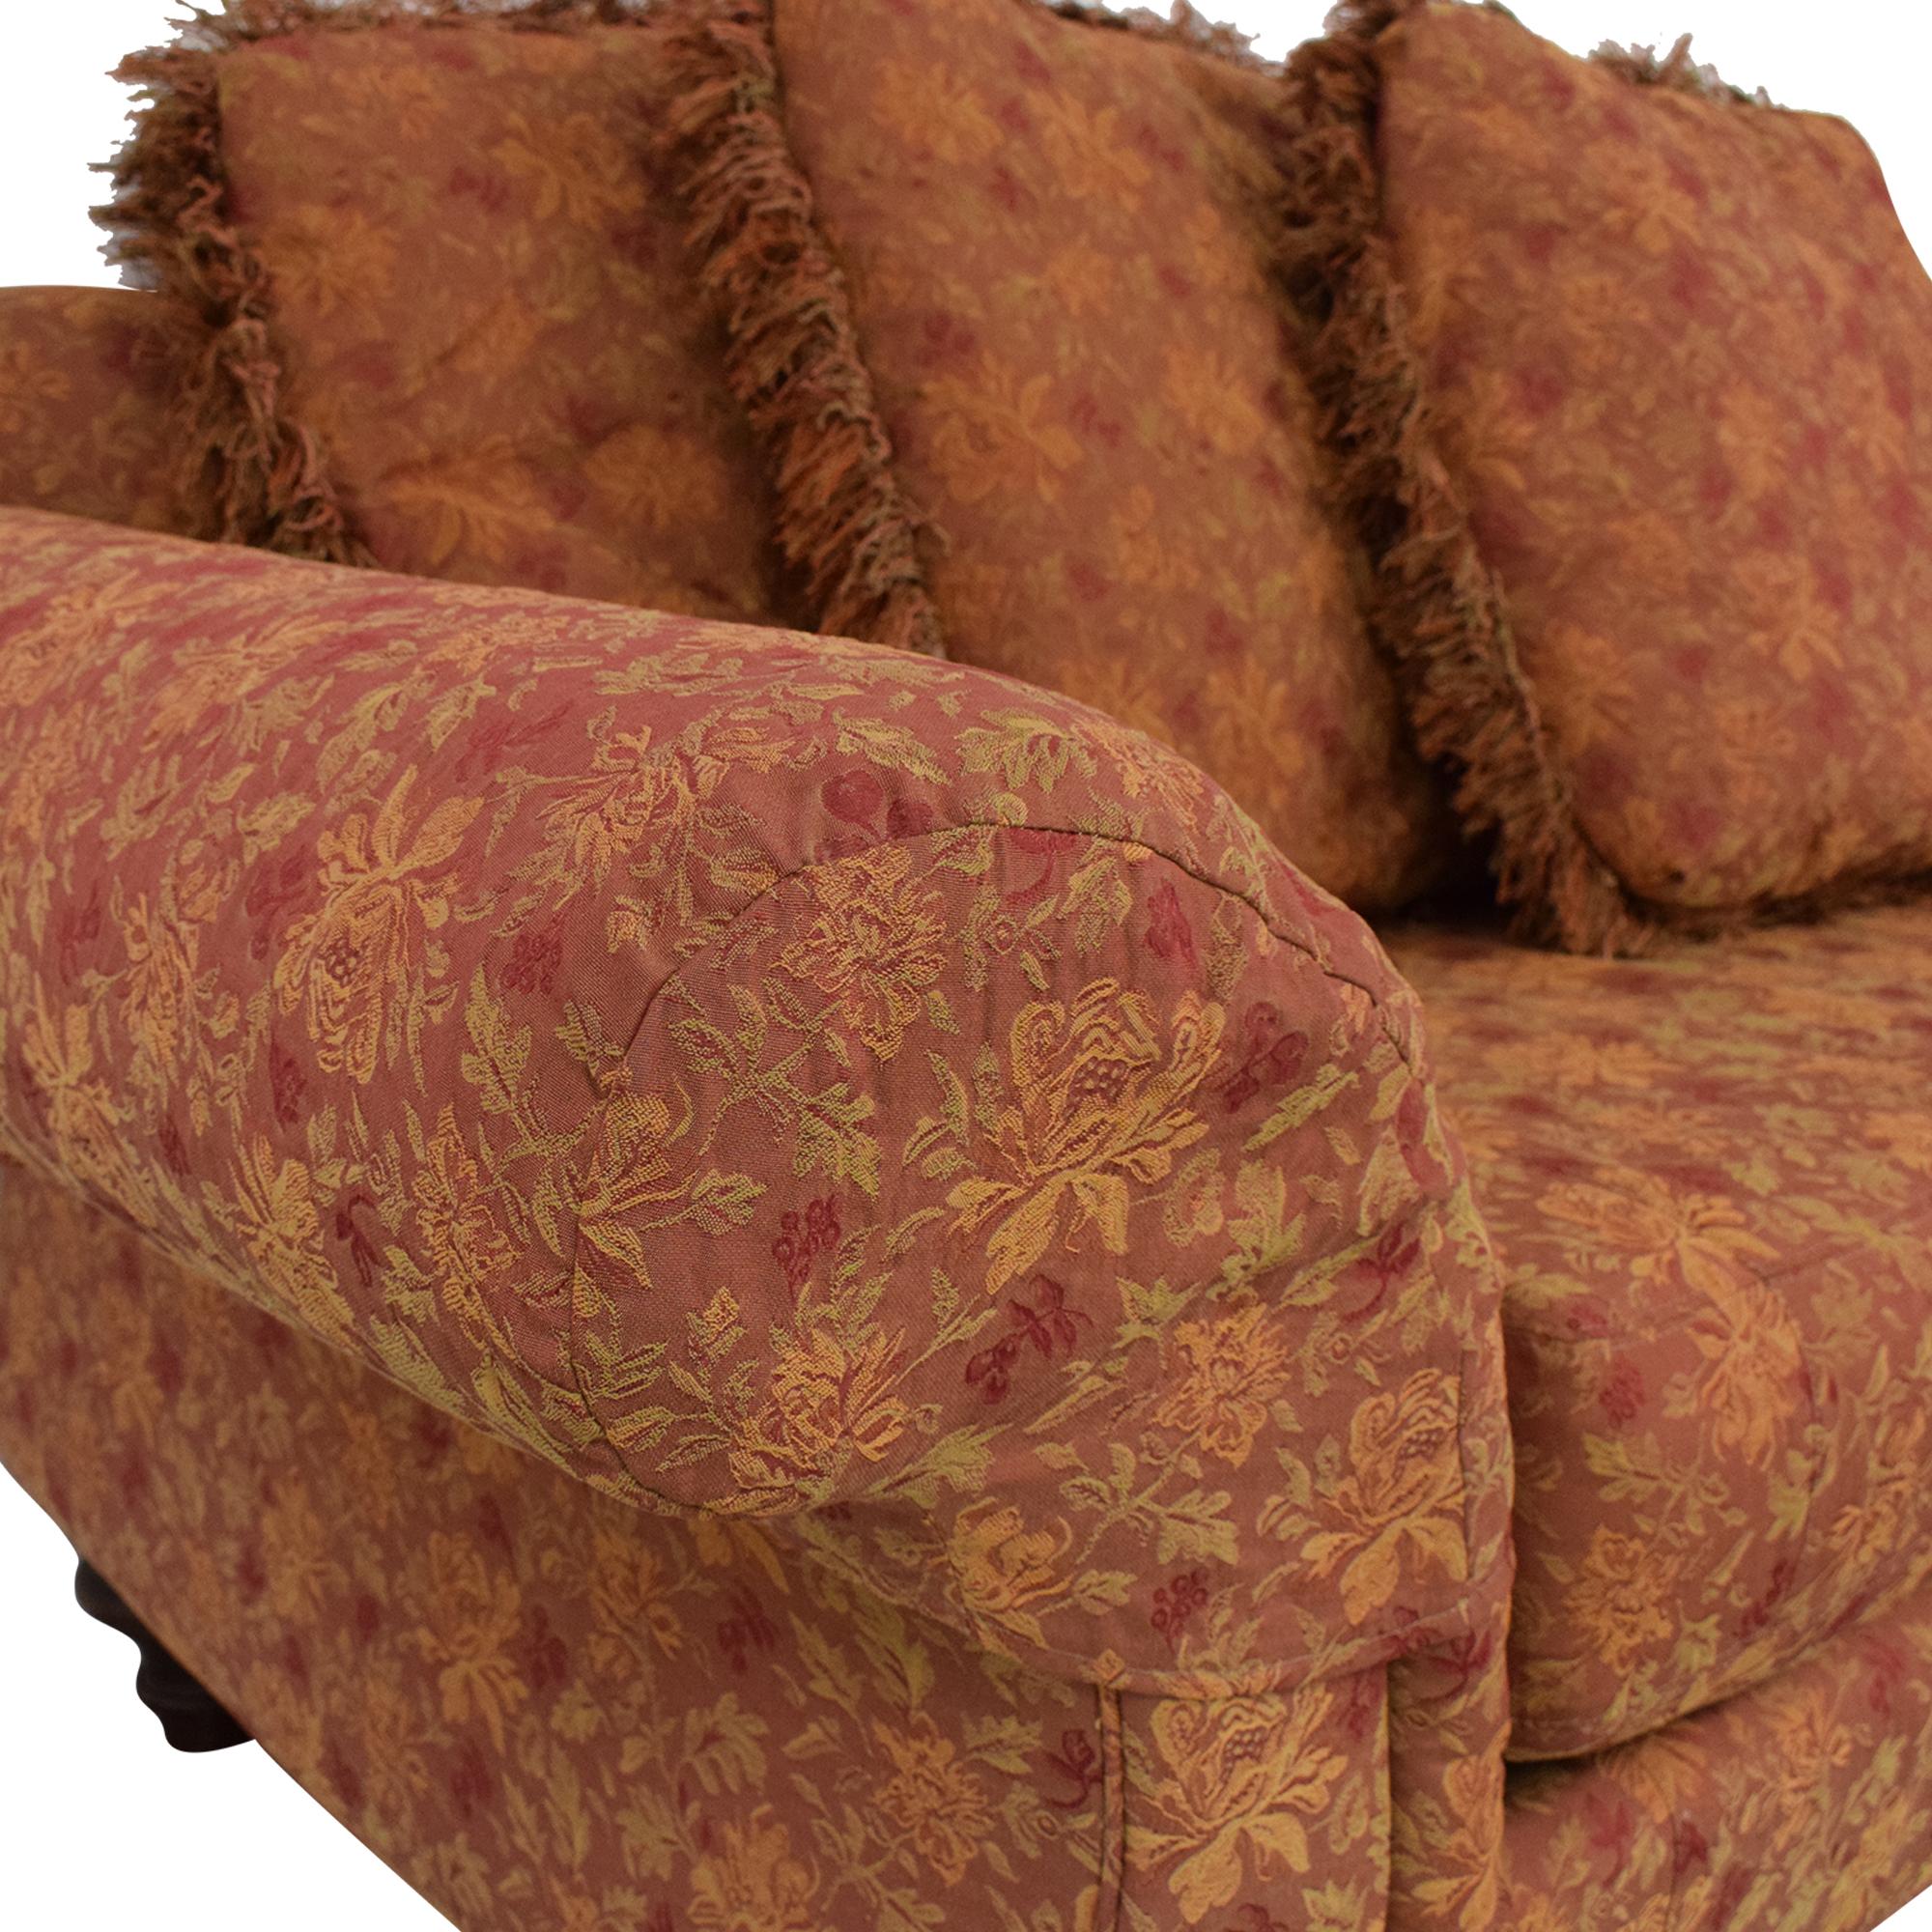 Vanguard Furniture Vanguard Single Cushion Sofa ma